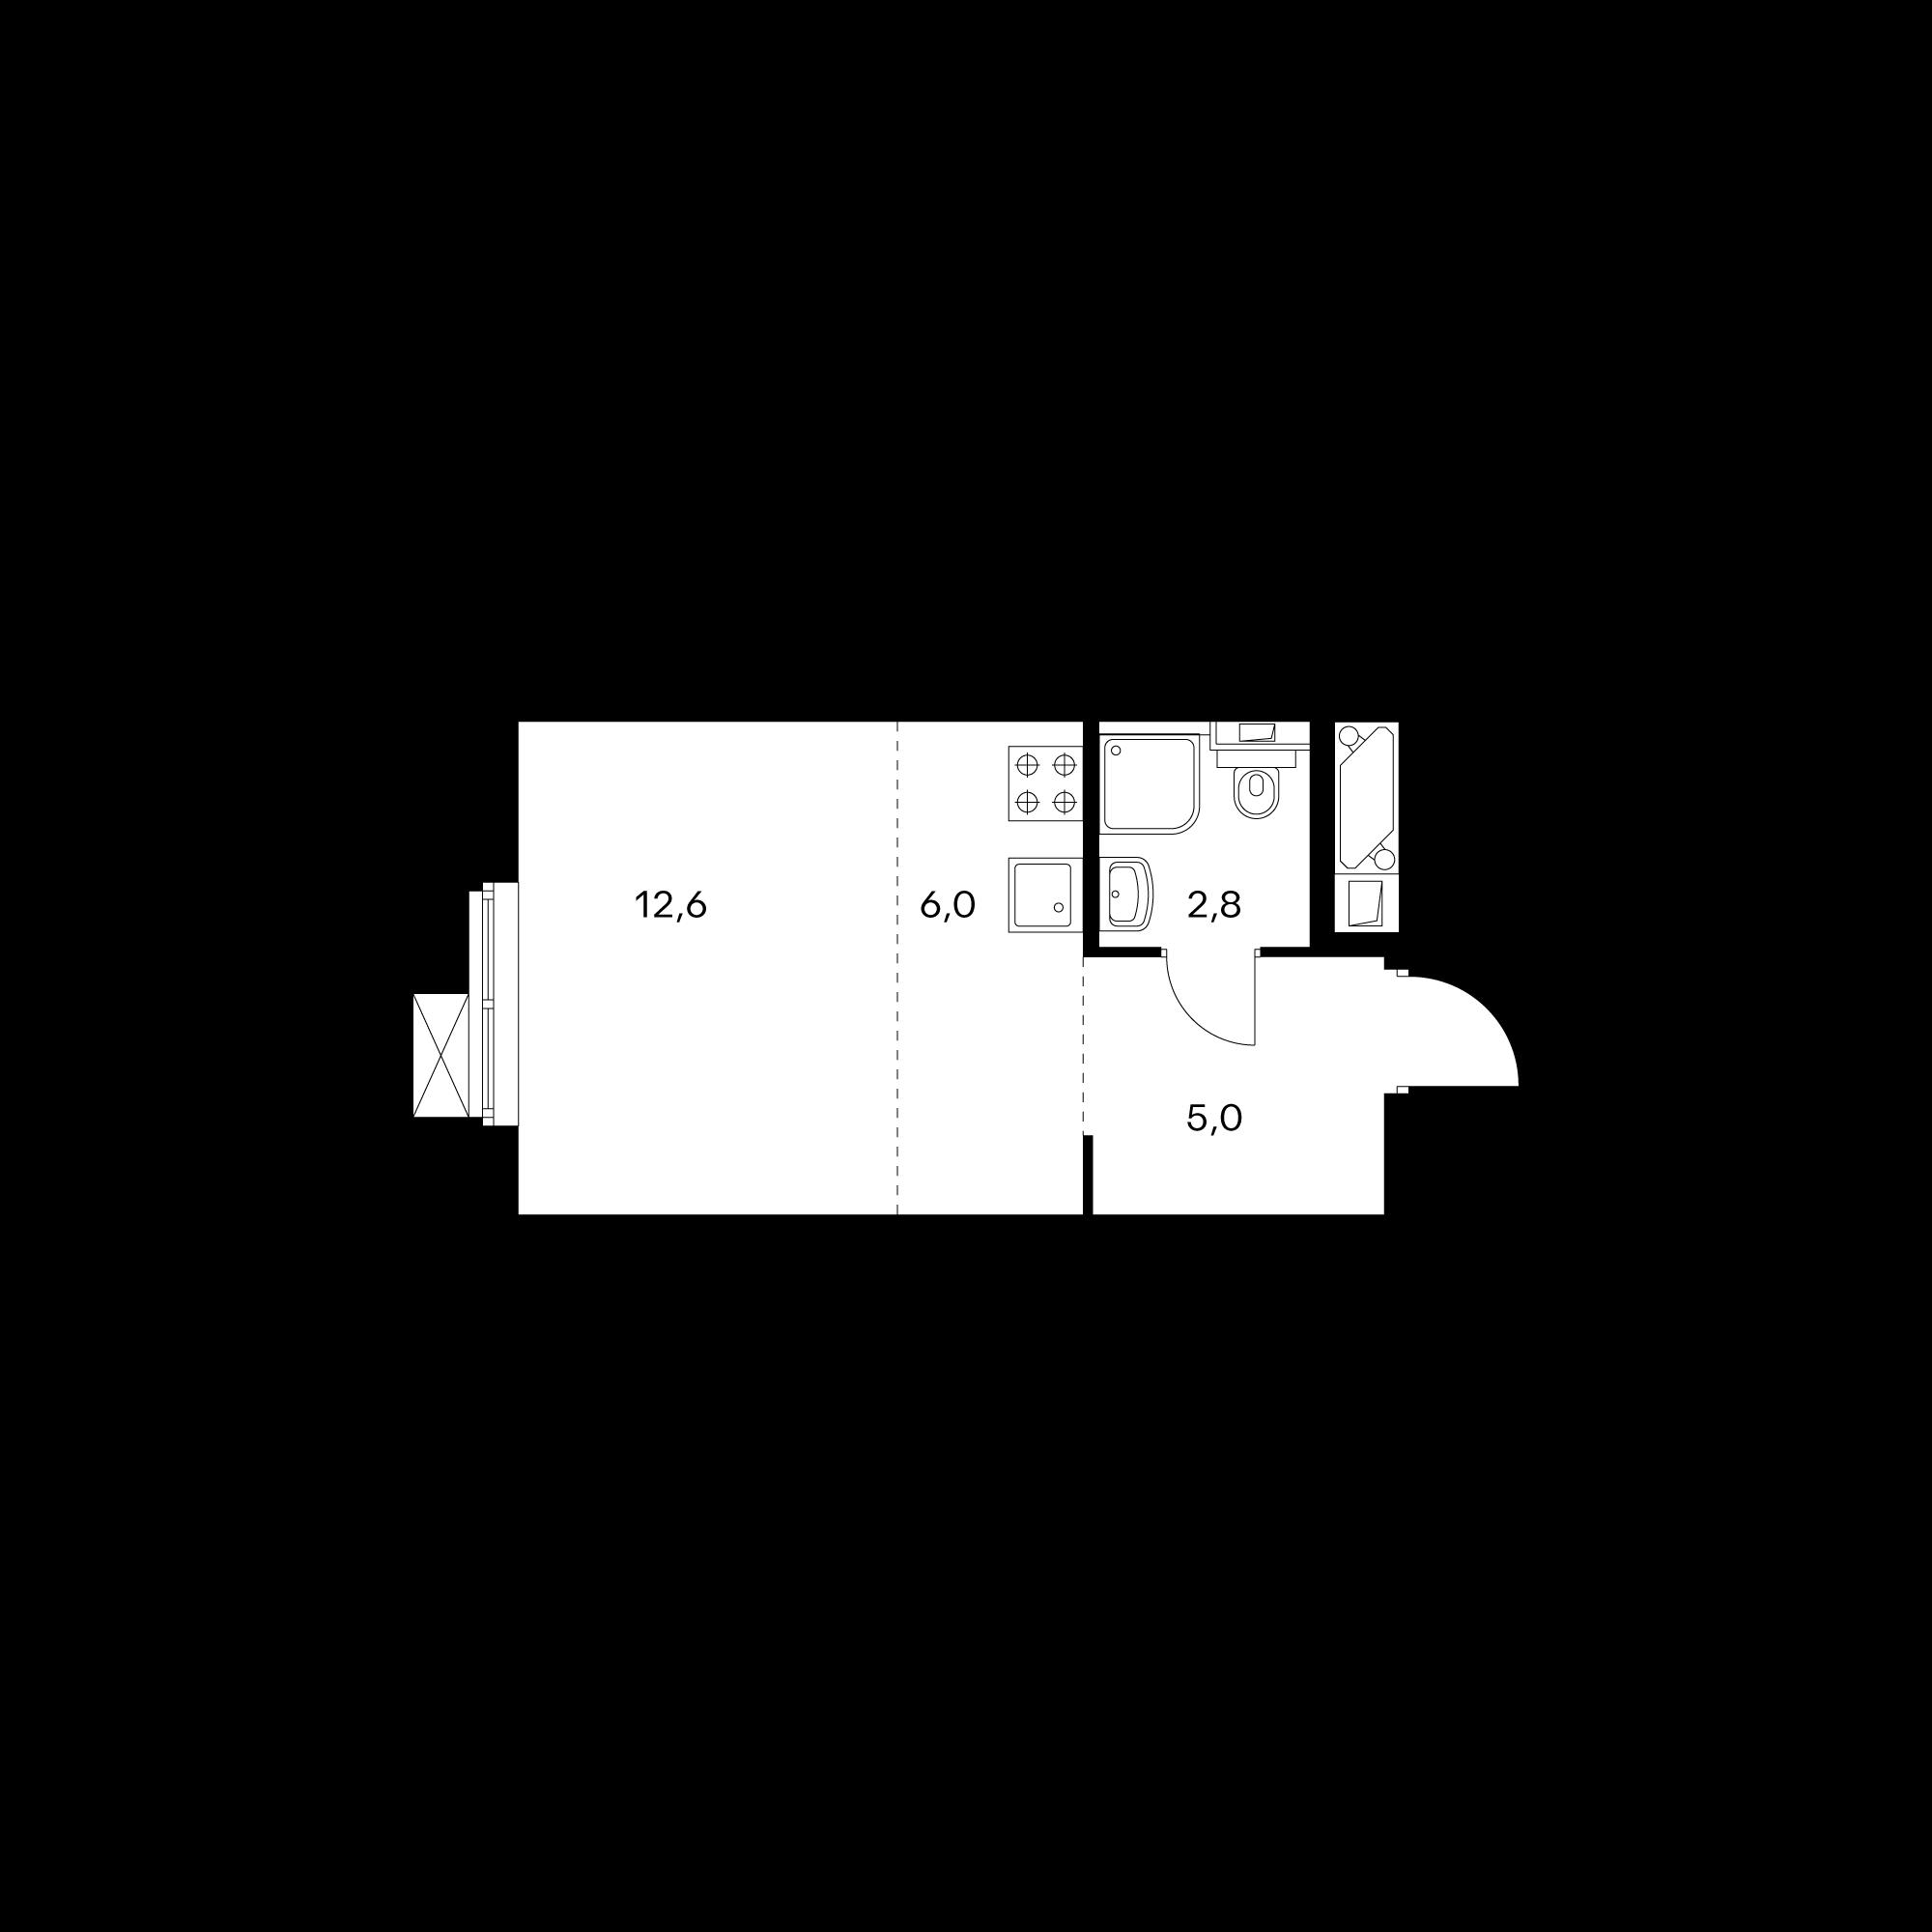 1NM1-1